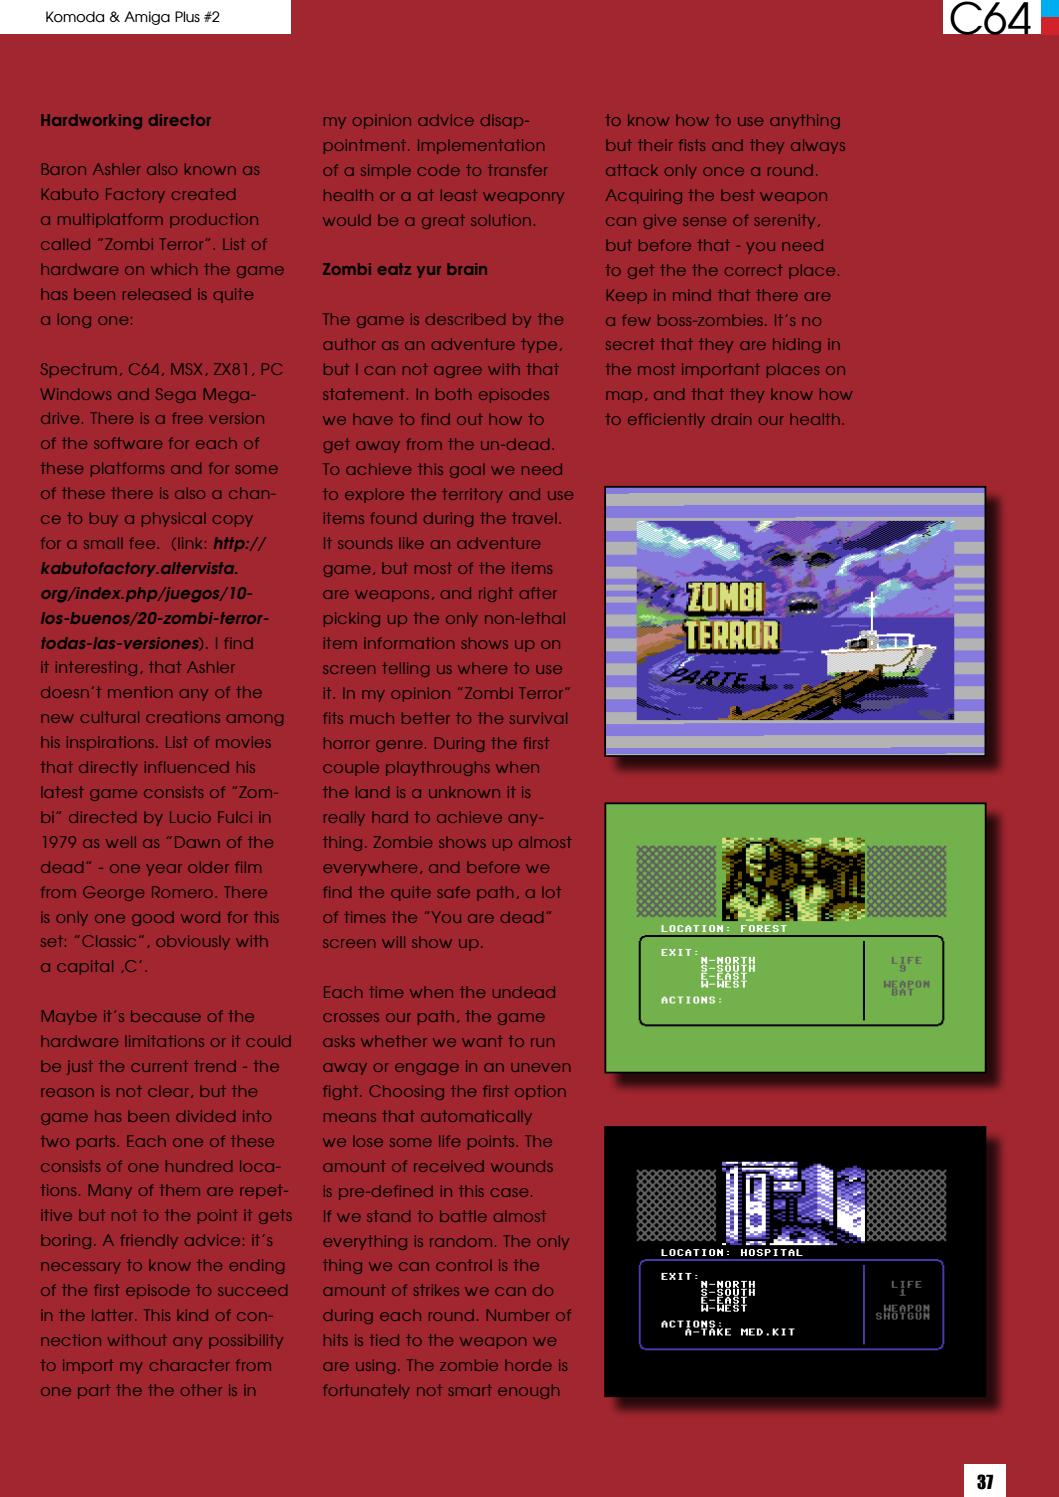 Komoda & Amiga plus #02 [ENGLISH edition] by Komoda and Amiga plus